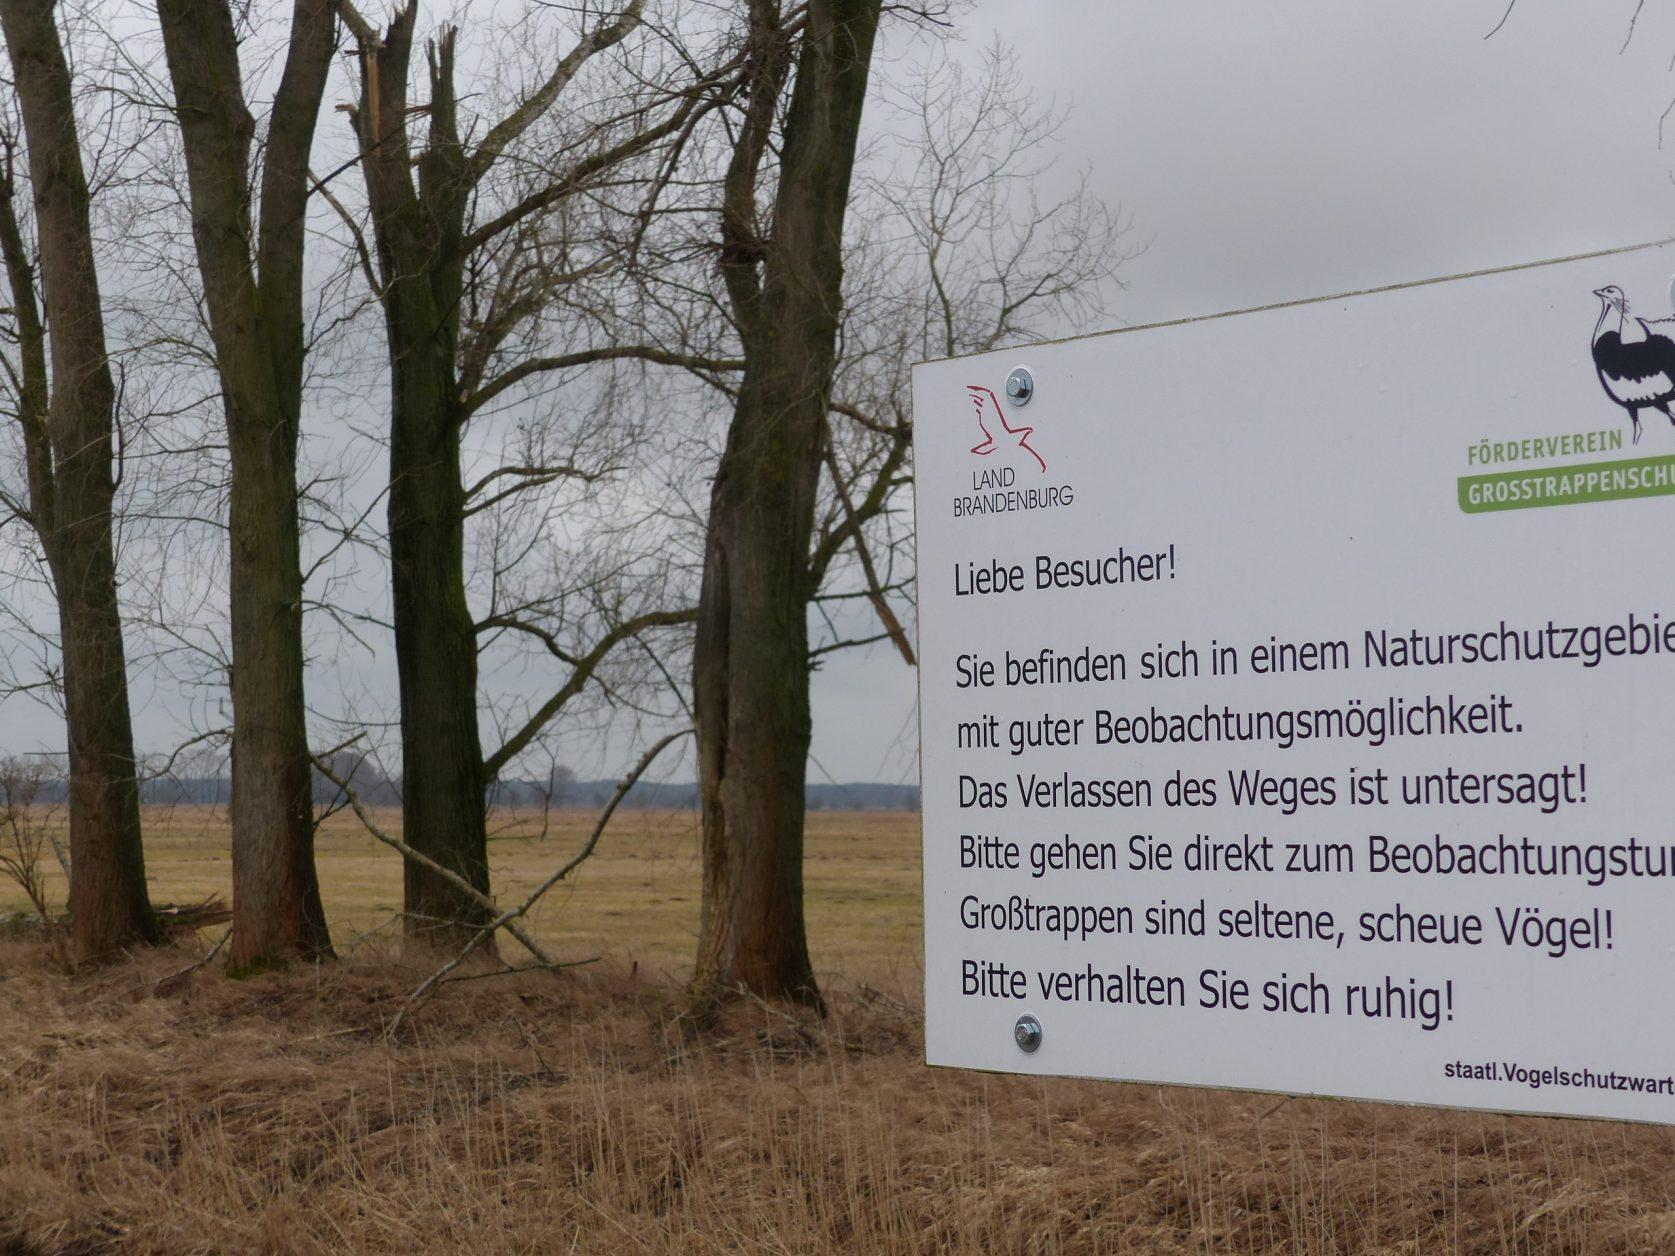 Großtrappen brauchen Ruhe, Hinweis auf dem Weg zum Beobachtungsturm Foto: Weirauch